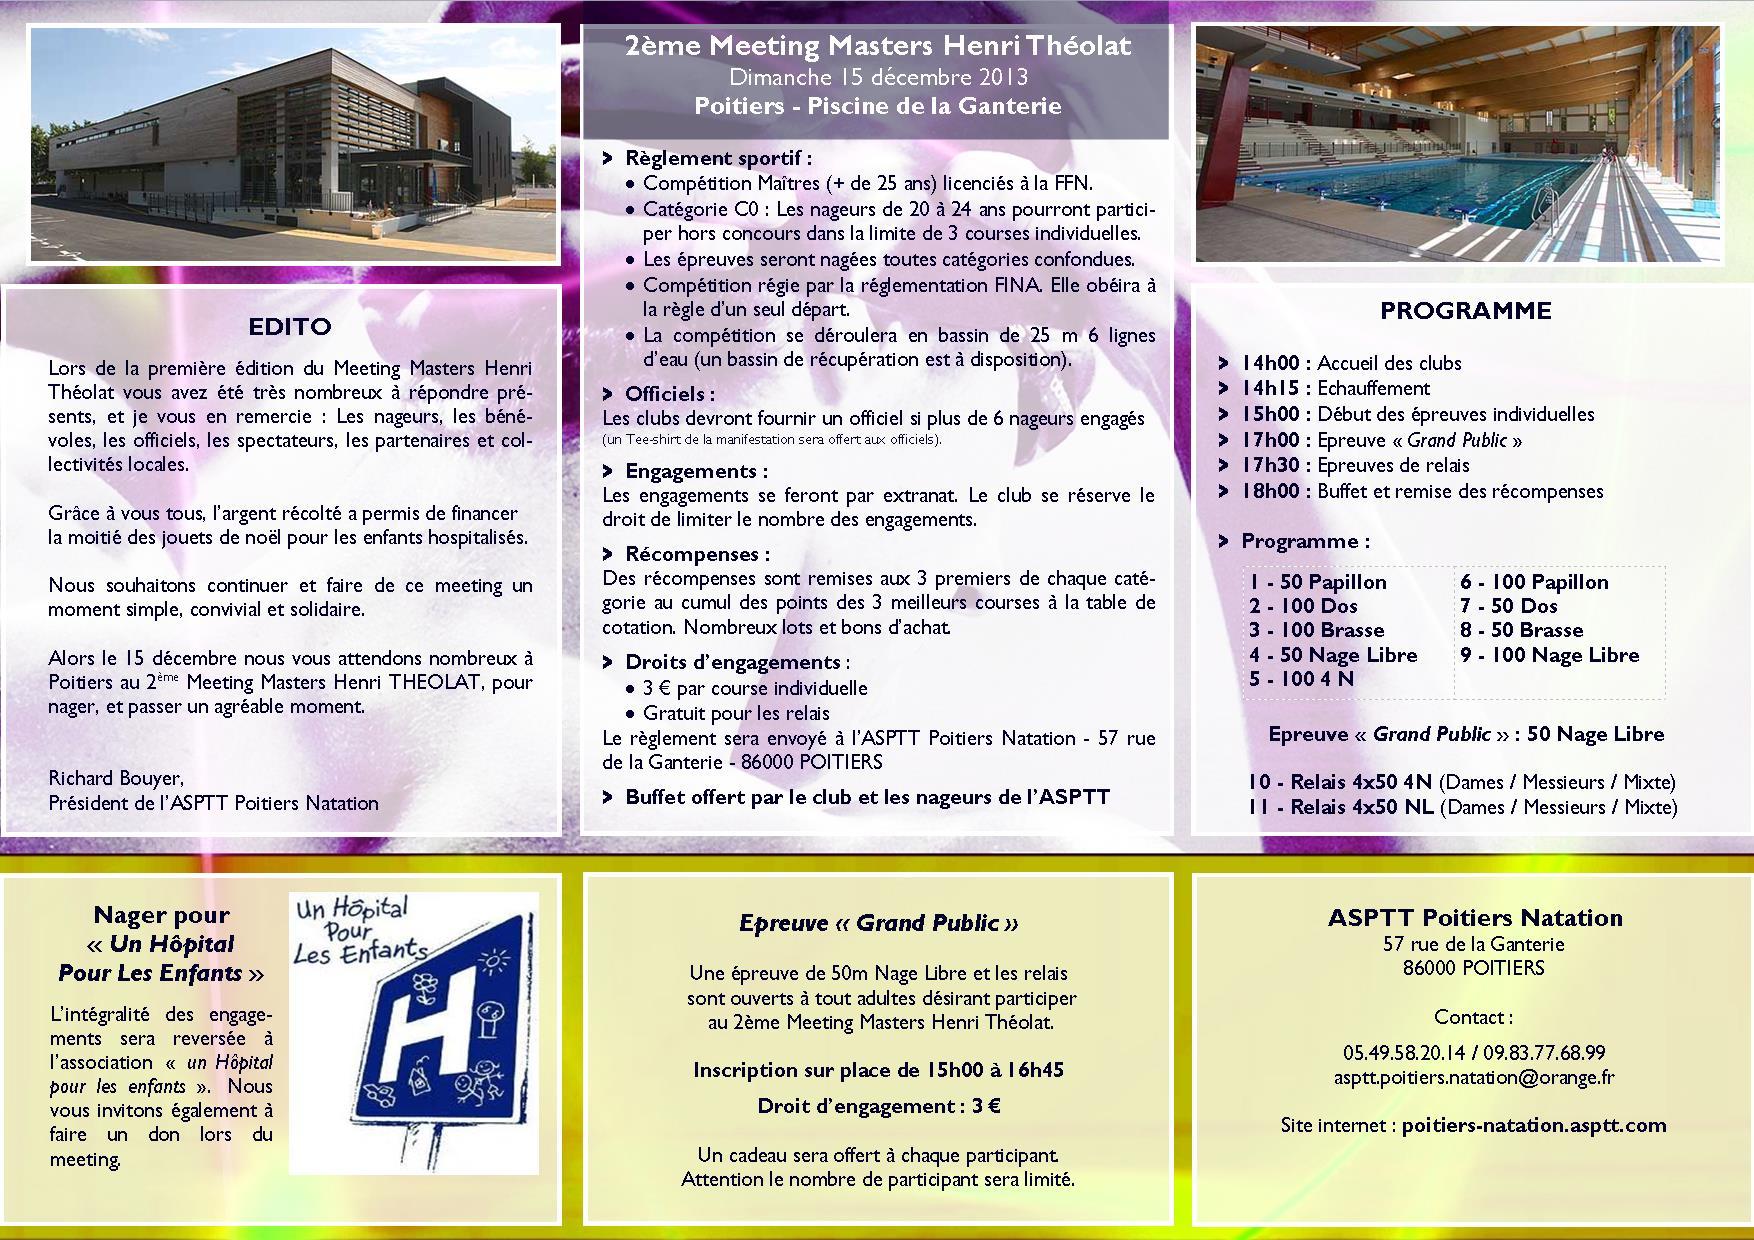 MMHT2 - Programme et règlement